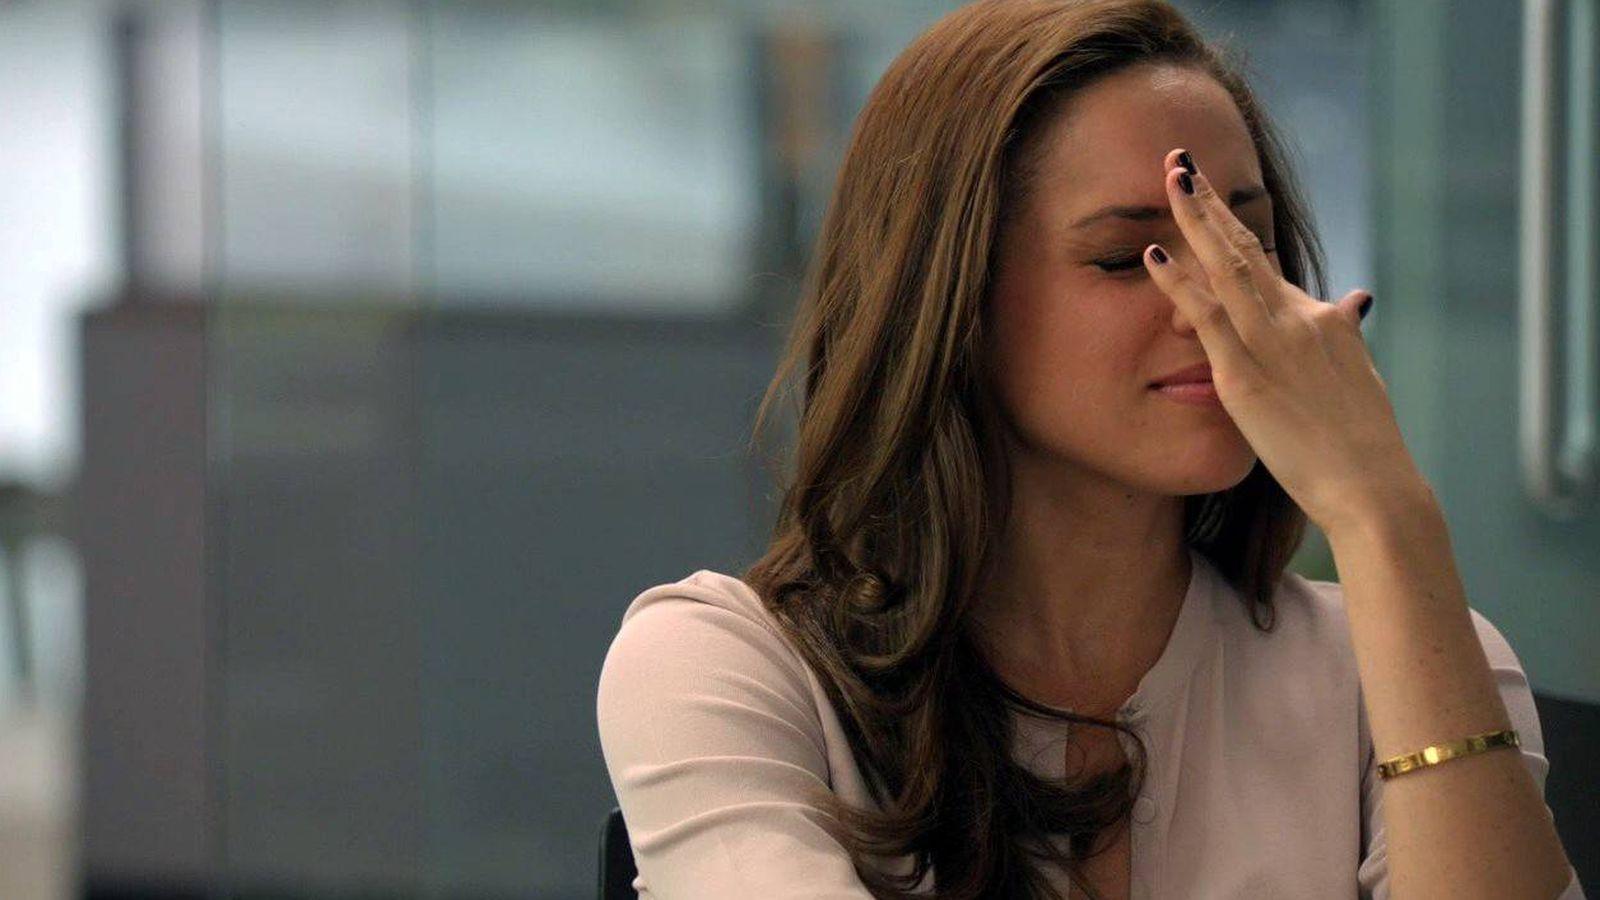 Foto: La actriz Meghan Markle en una imagen de la serie 'Suits'.